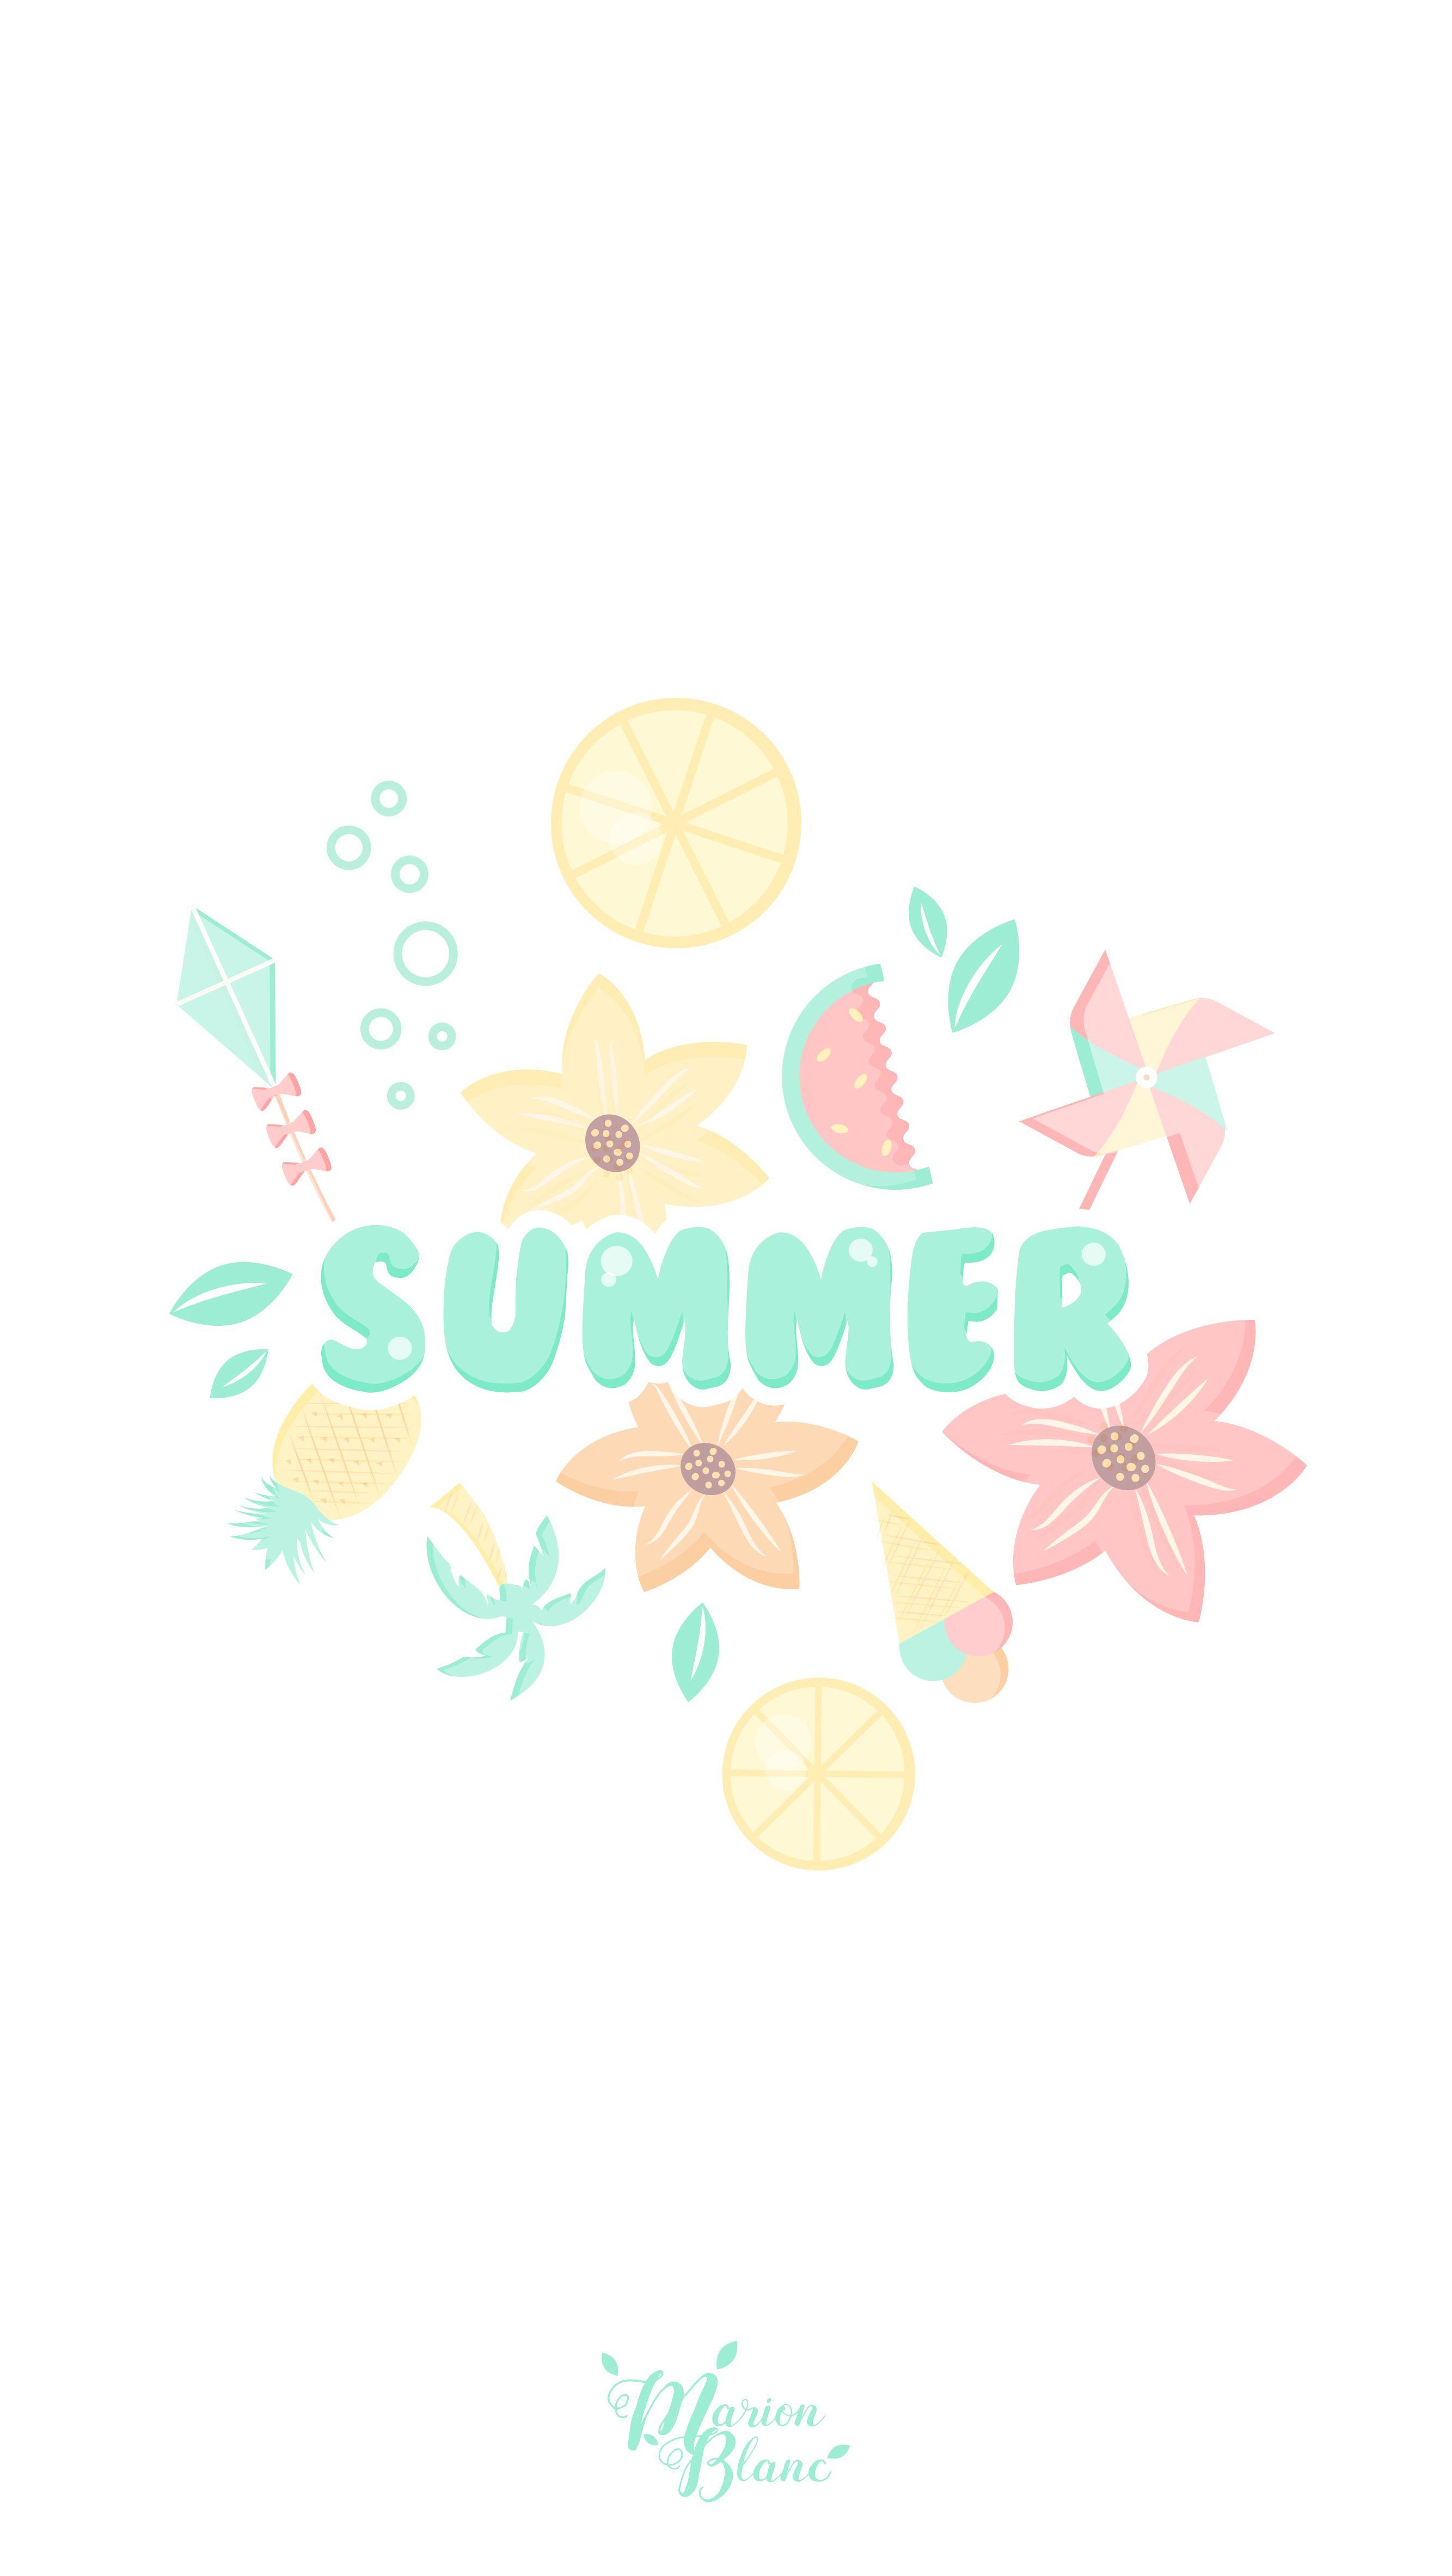 Summer Marion Blanc Cute Summer Wallpapers Summer Wallpaper Iphone Wallpaper